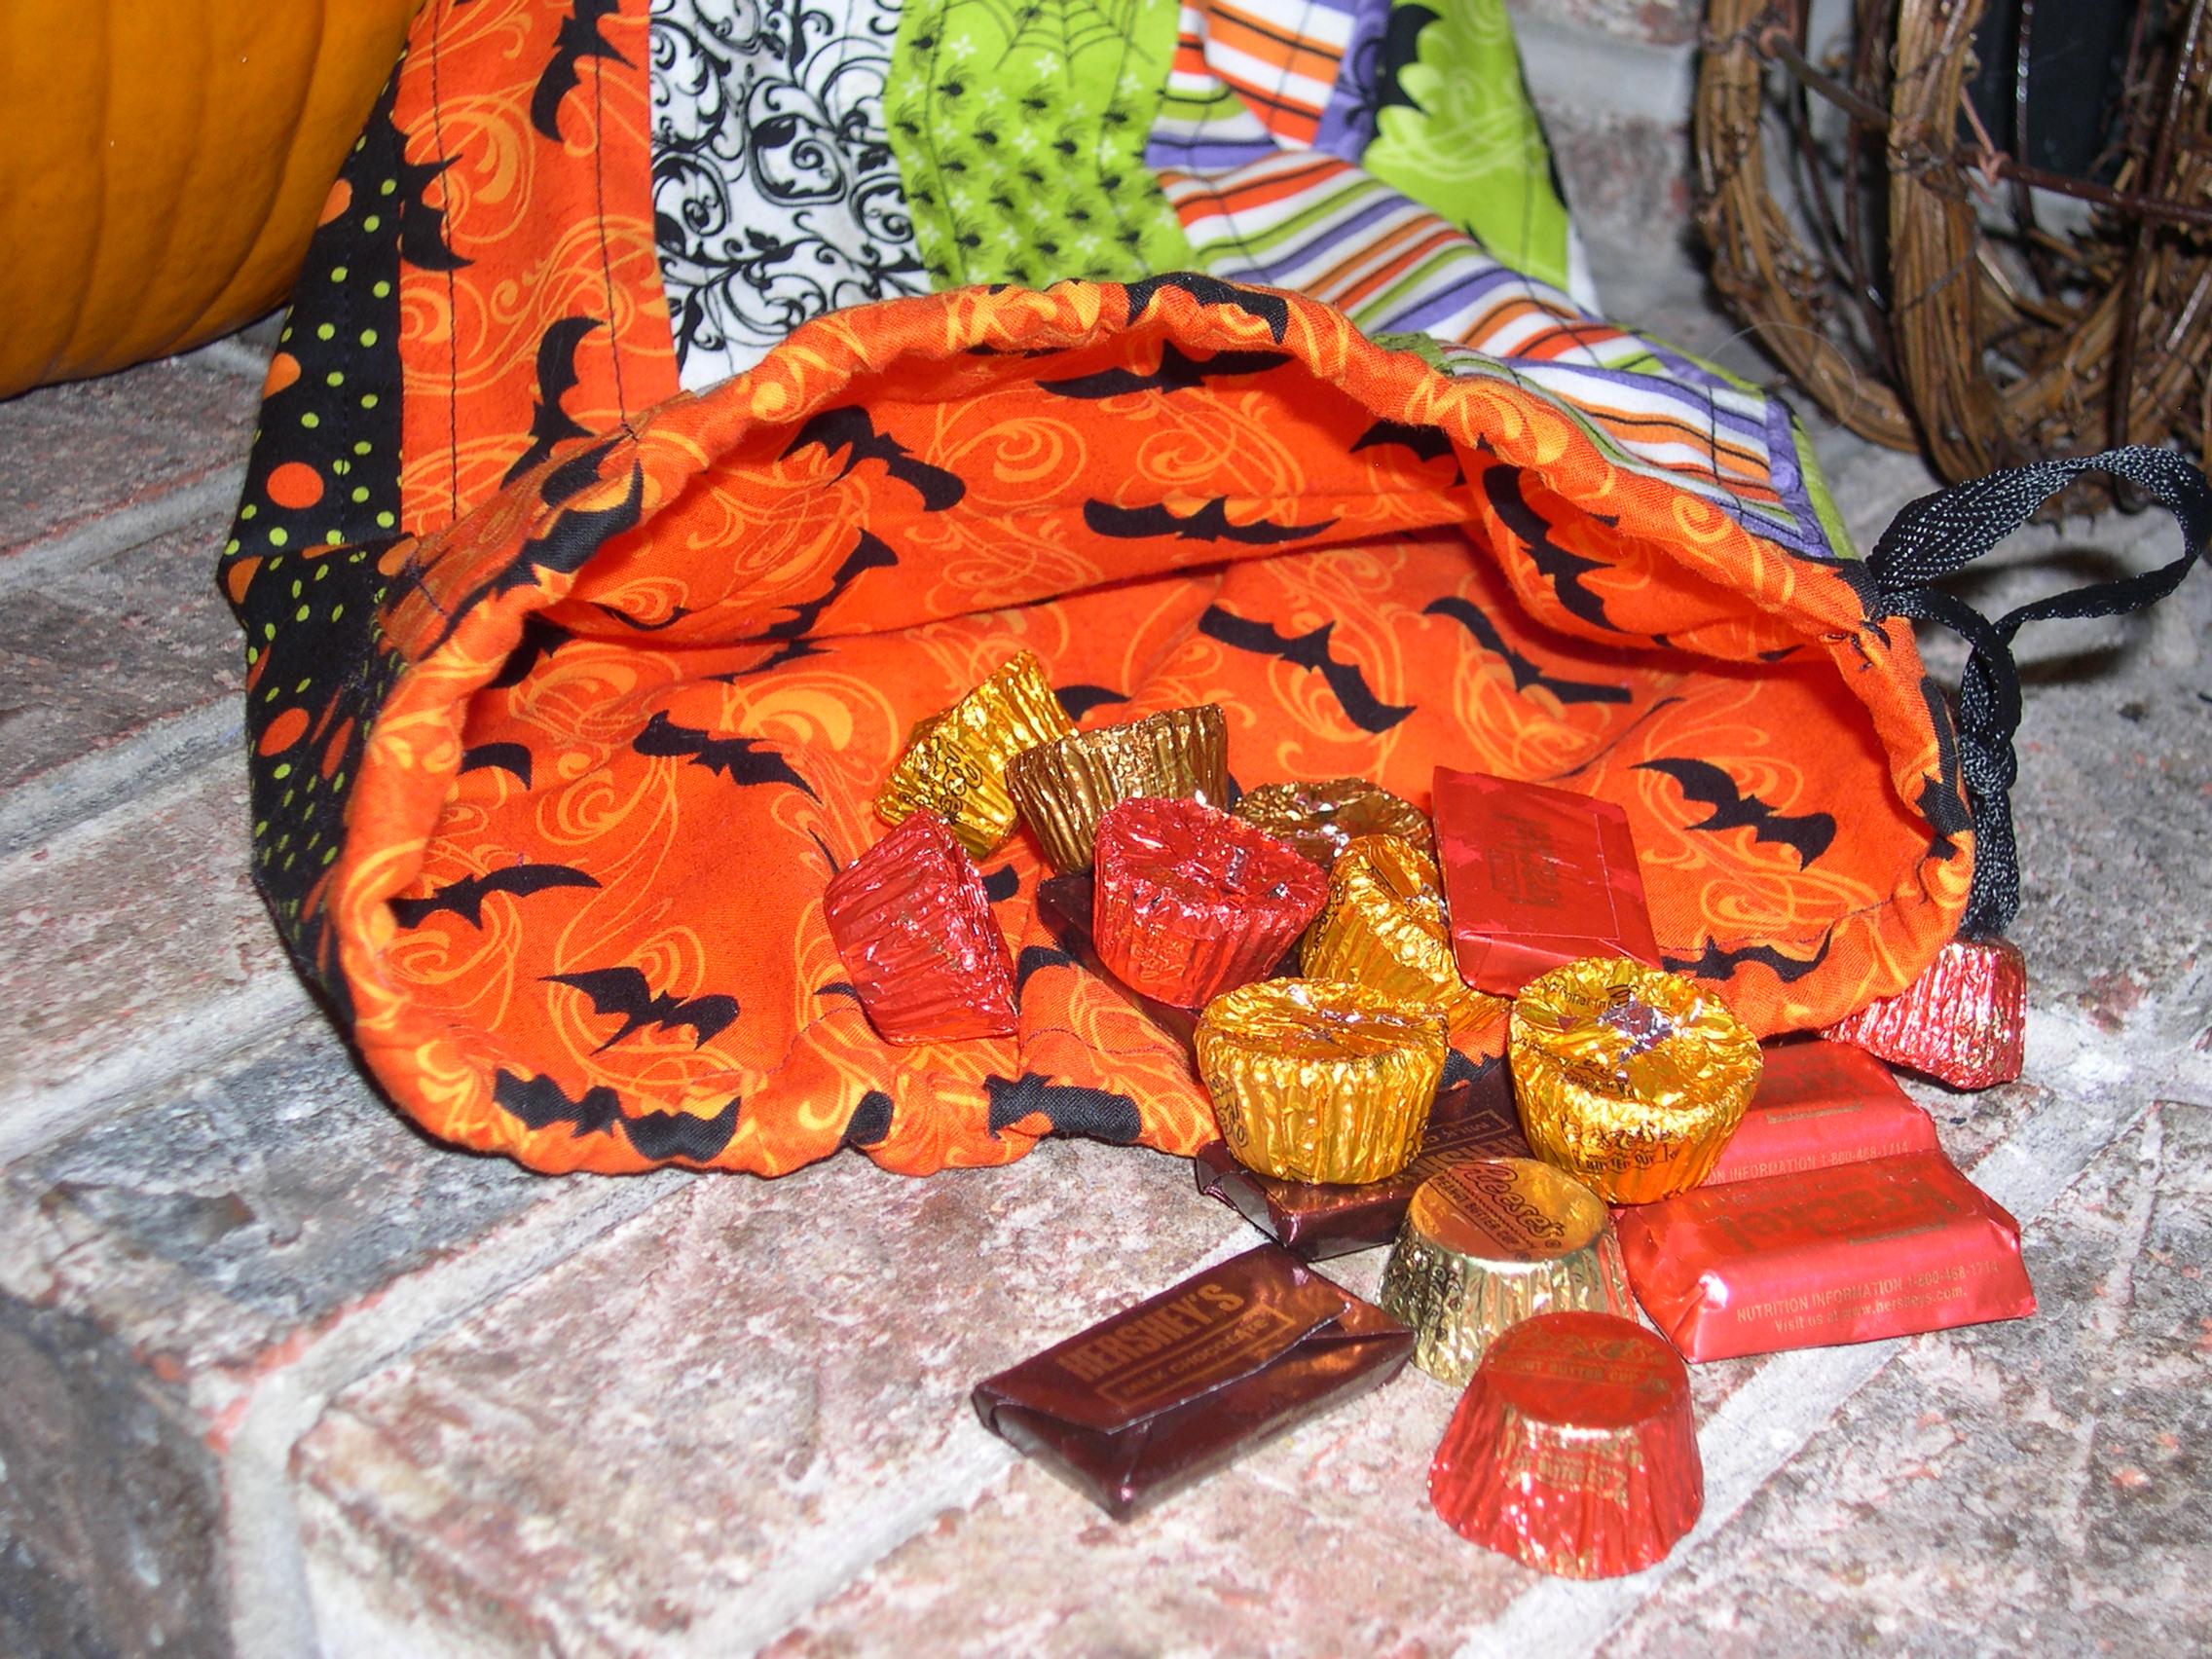 orange lined treat sack